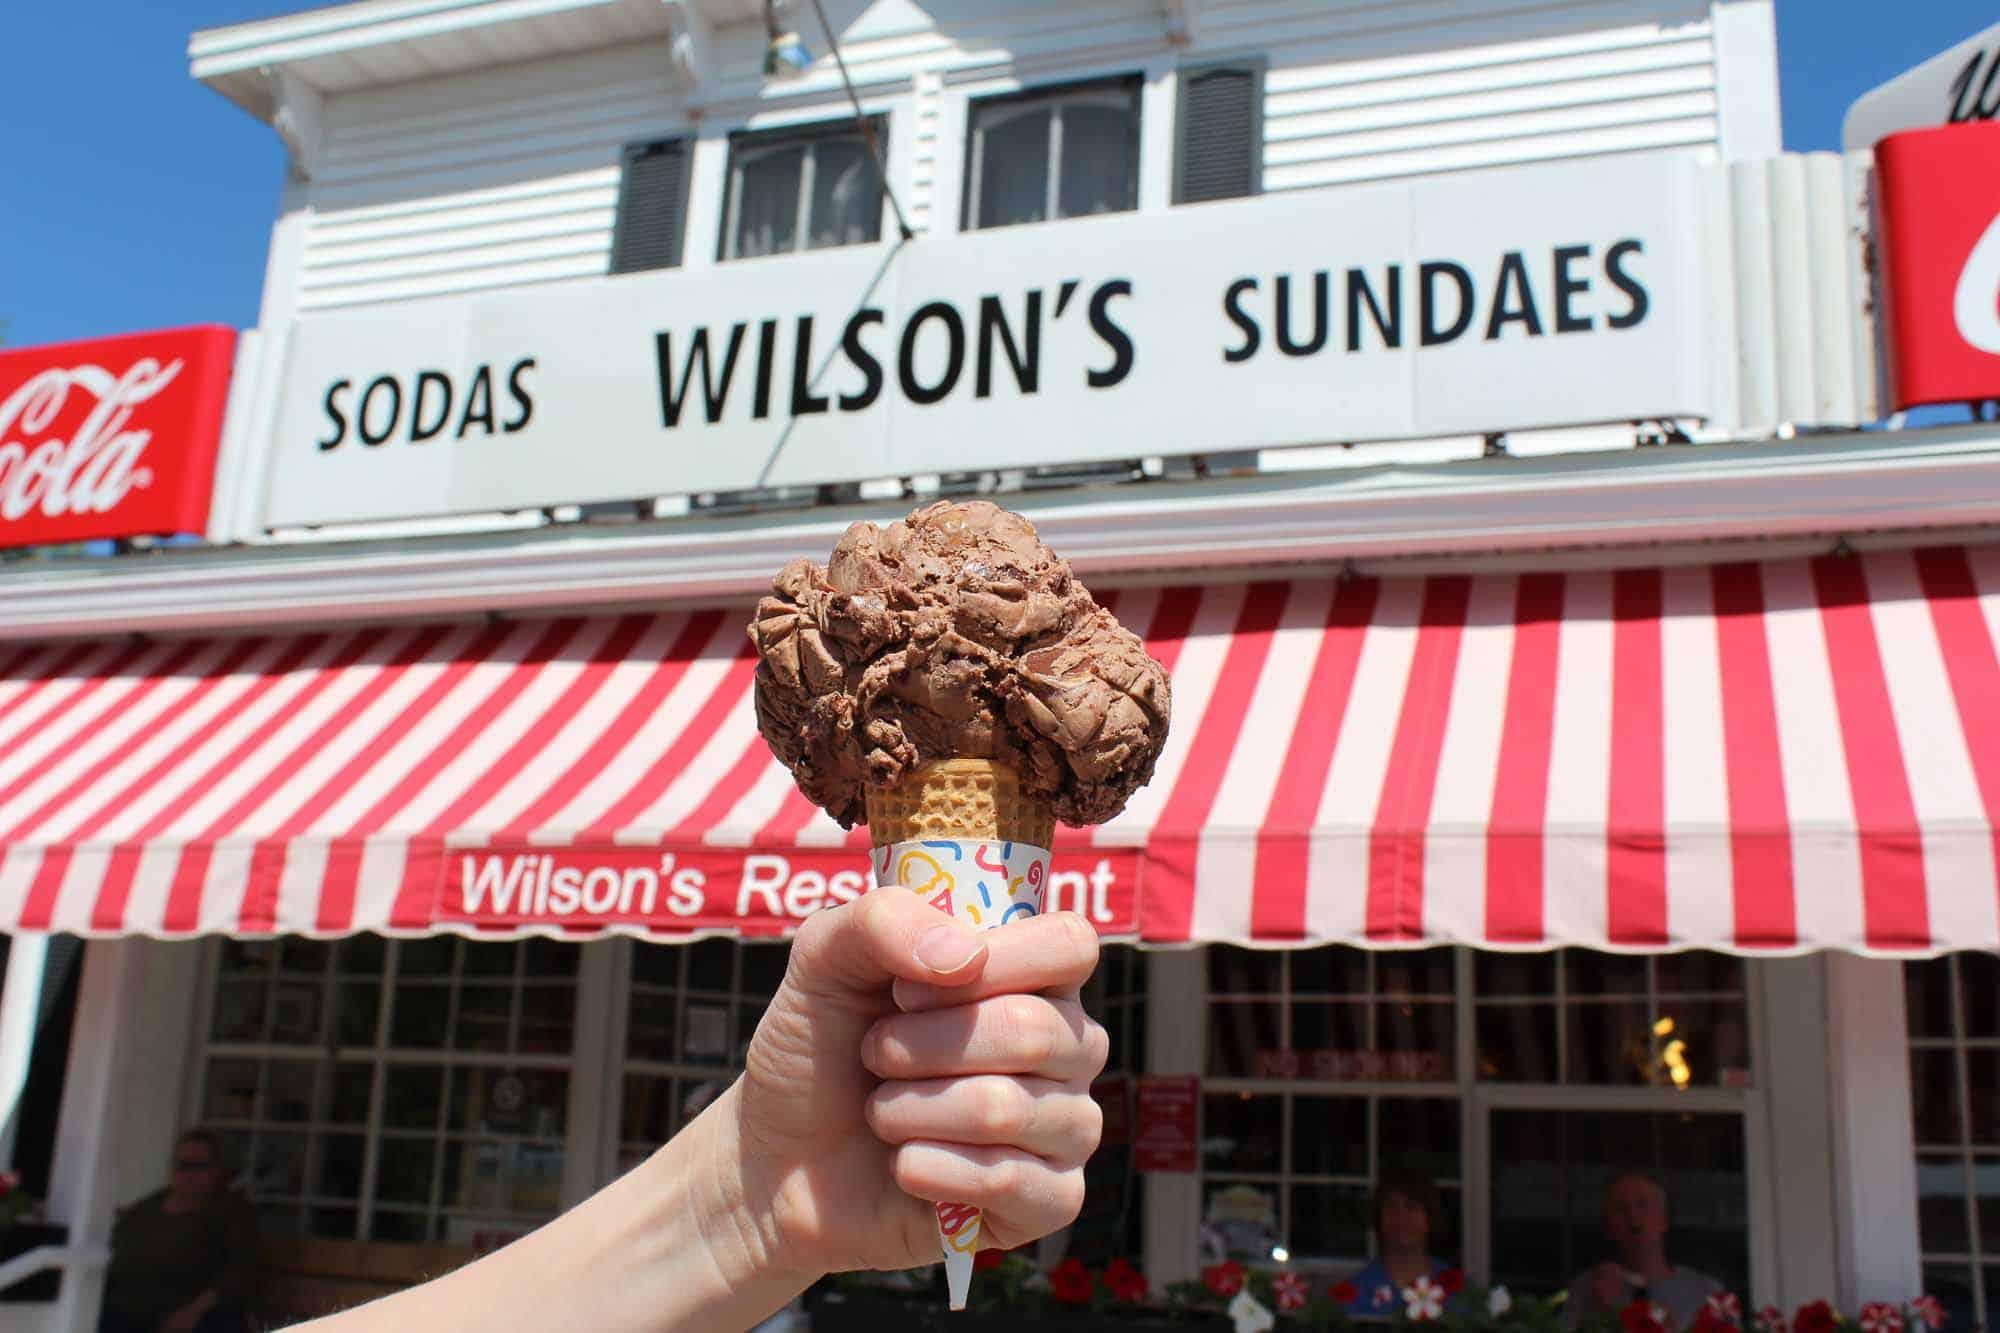 Ephraim Shores places to stay near Wilson's ice cream